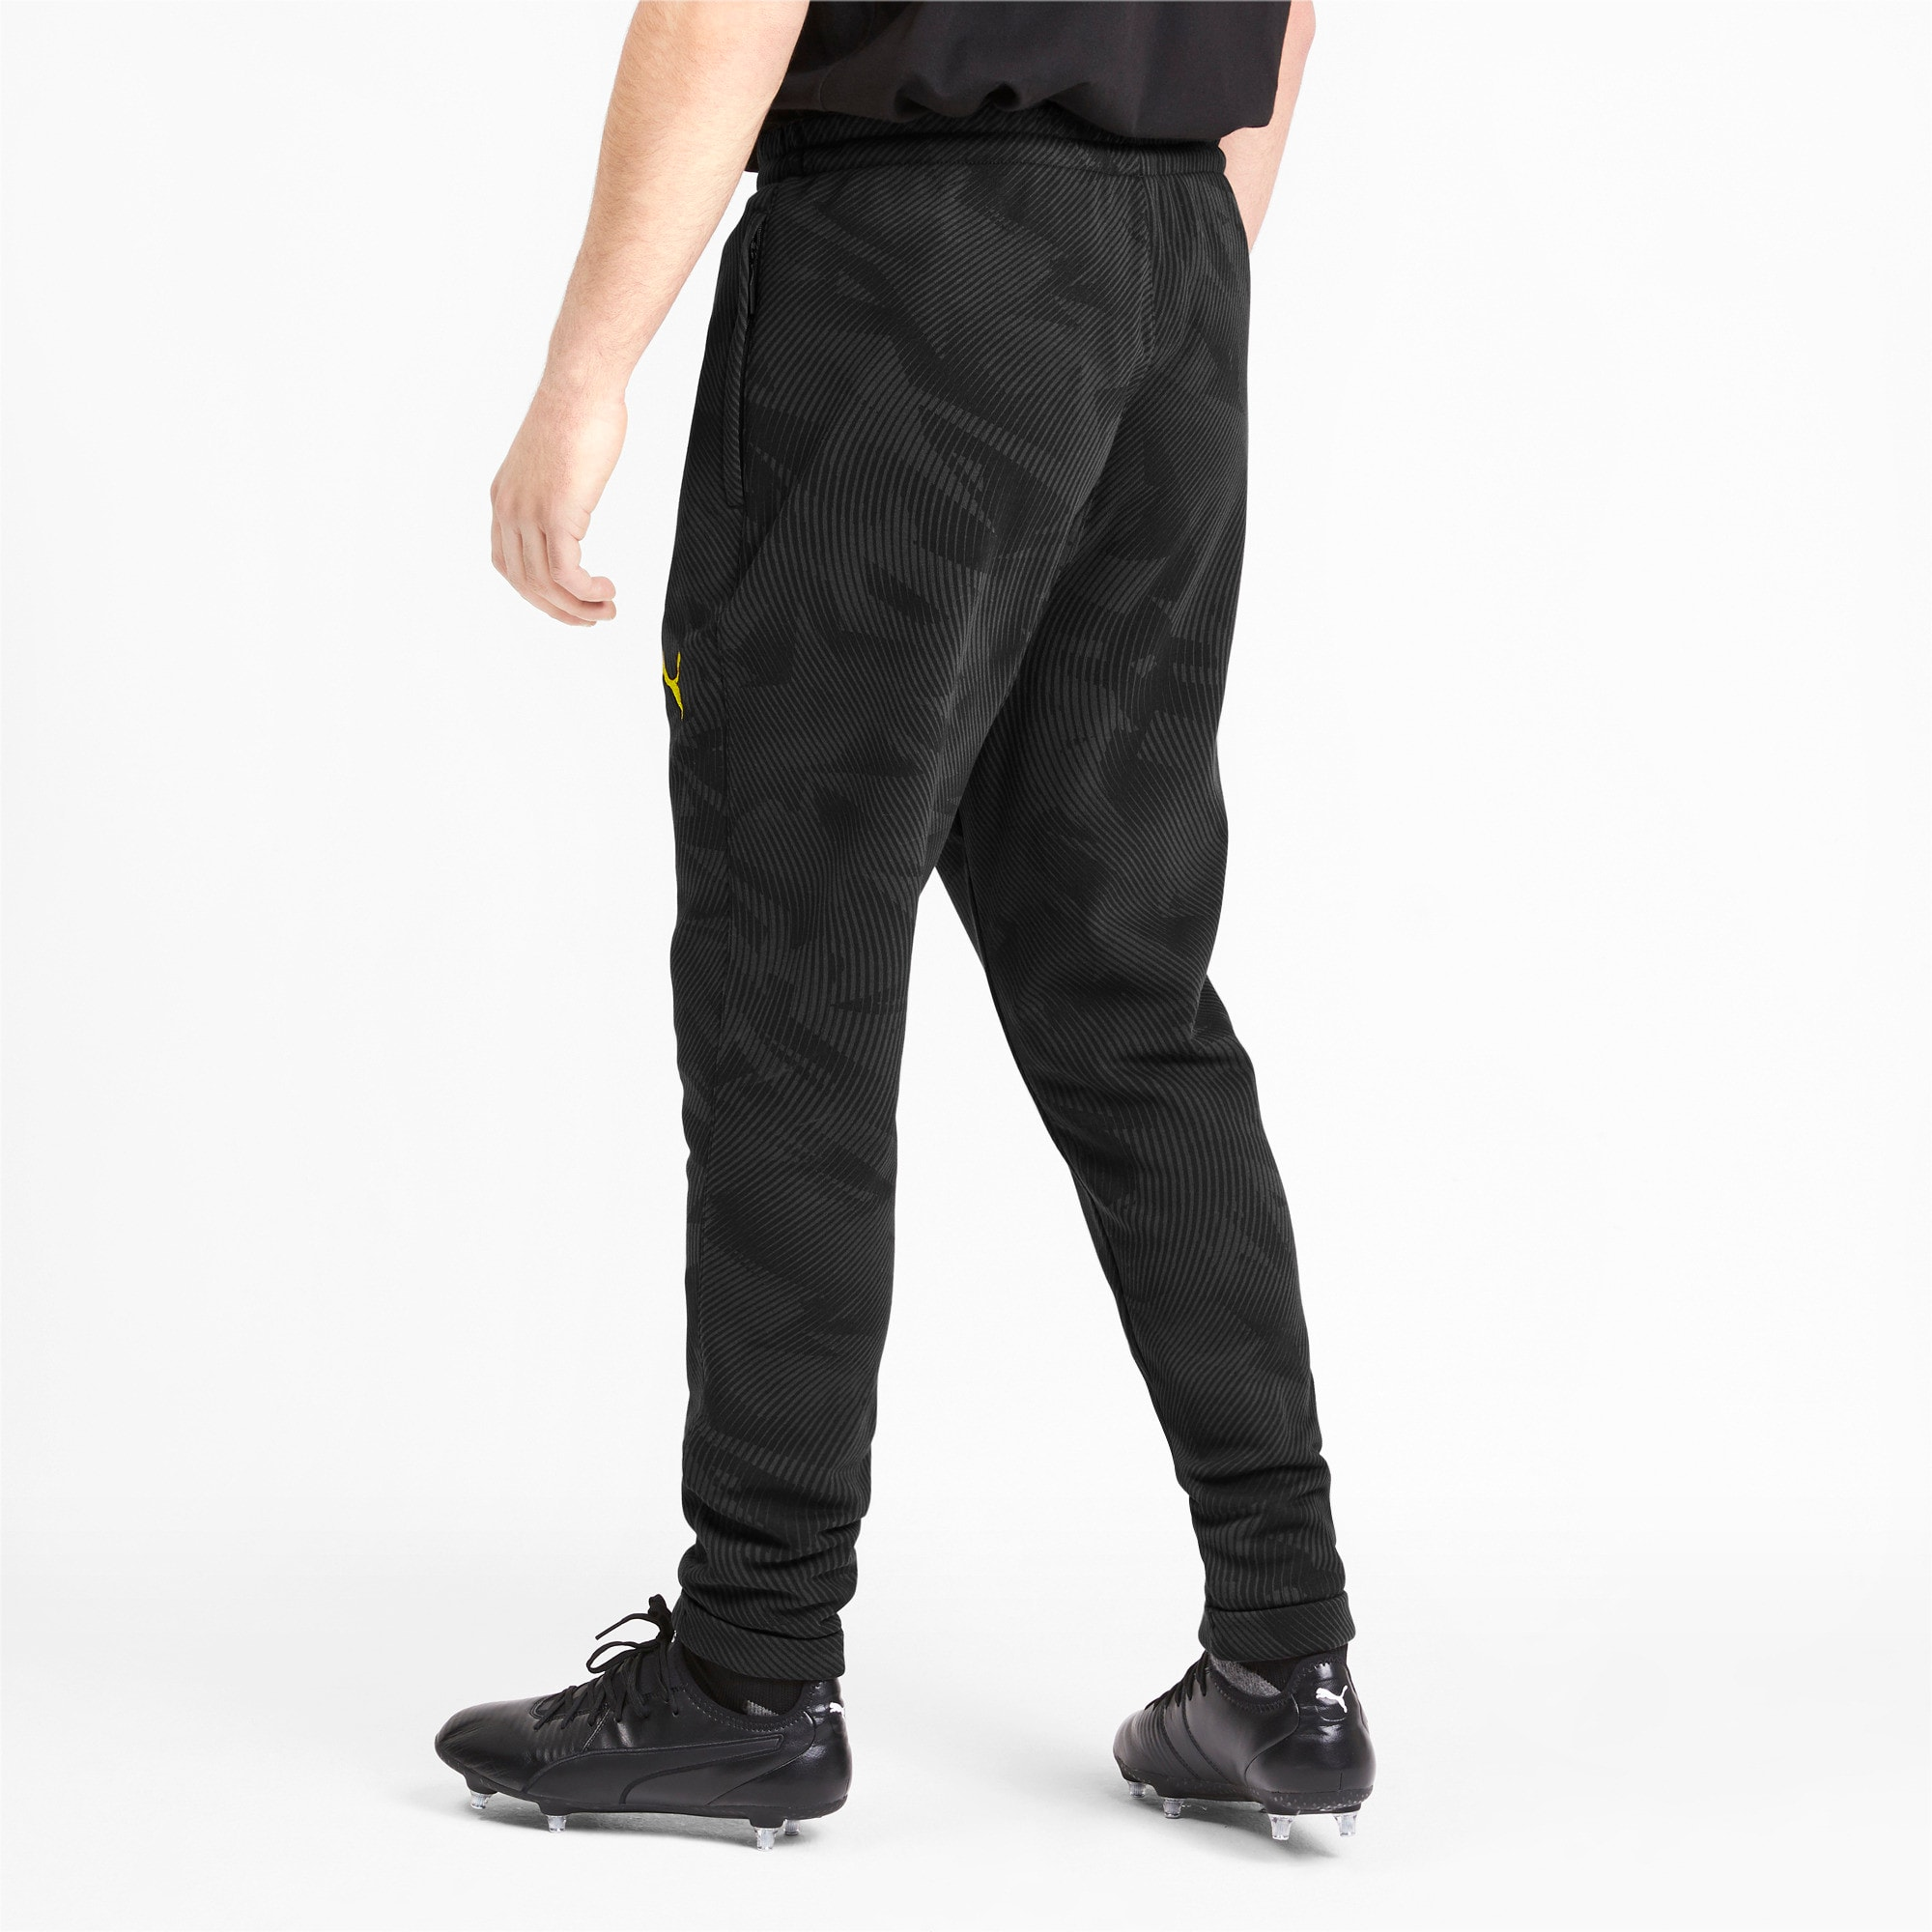 Thumbnail 2 of BVB Men's Casual Pants, Puma Black-Phantom Black, medium